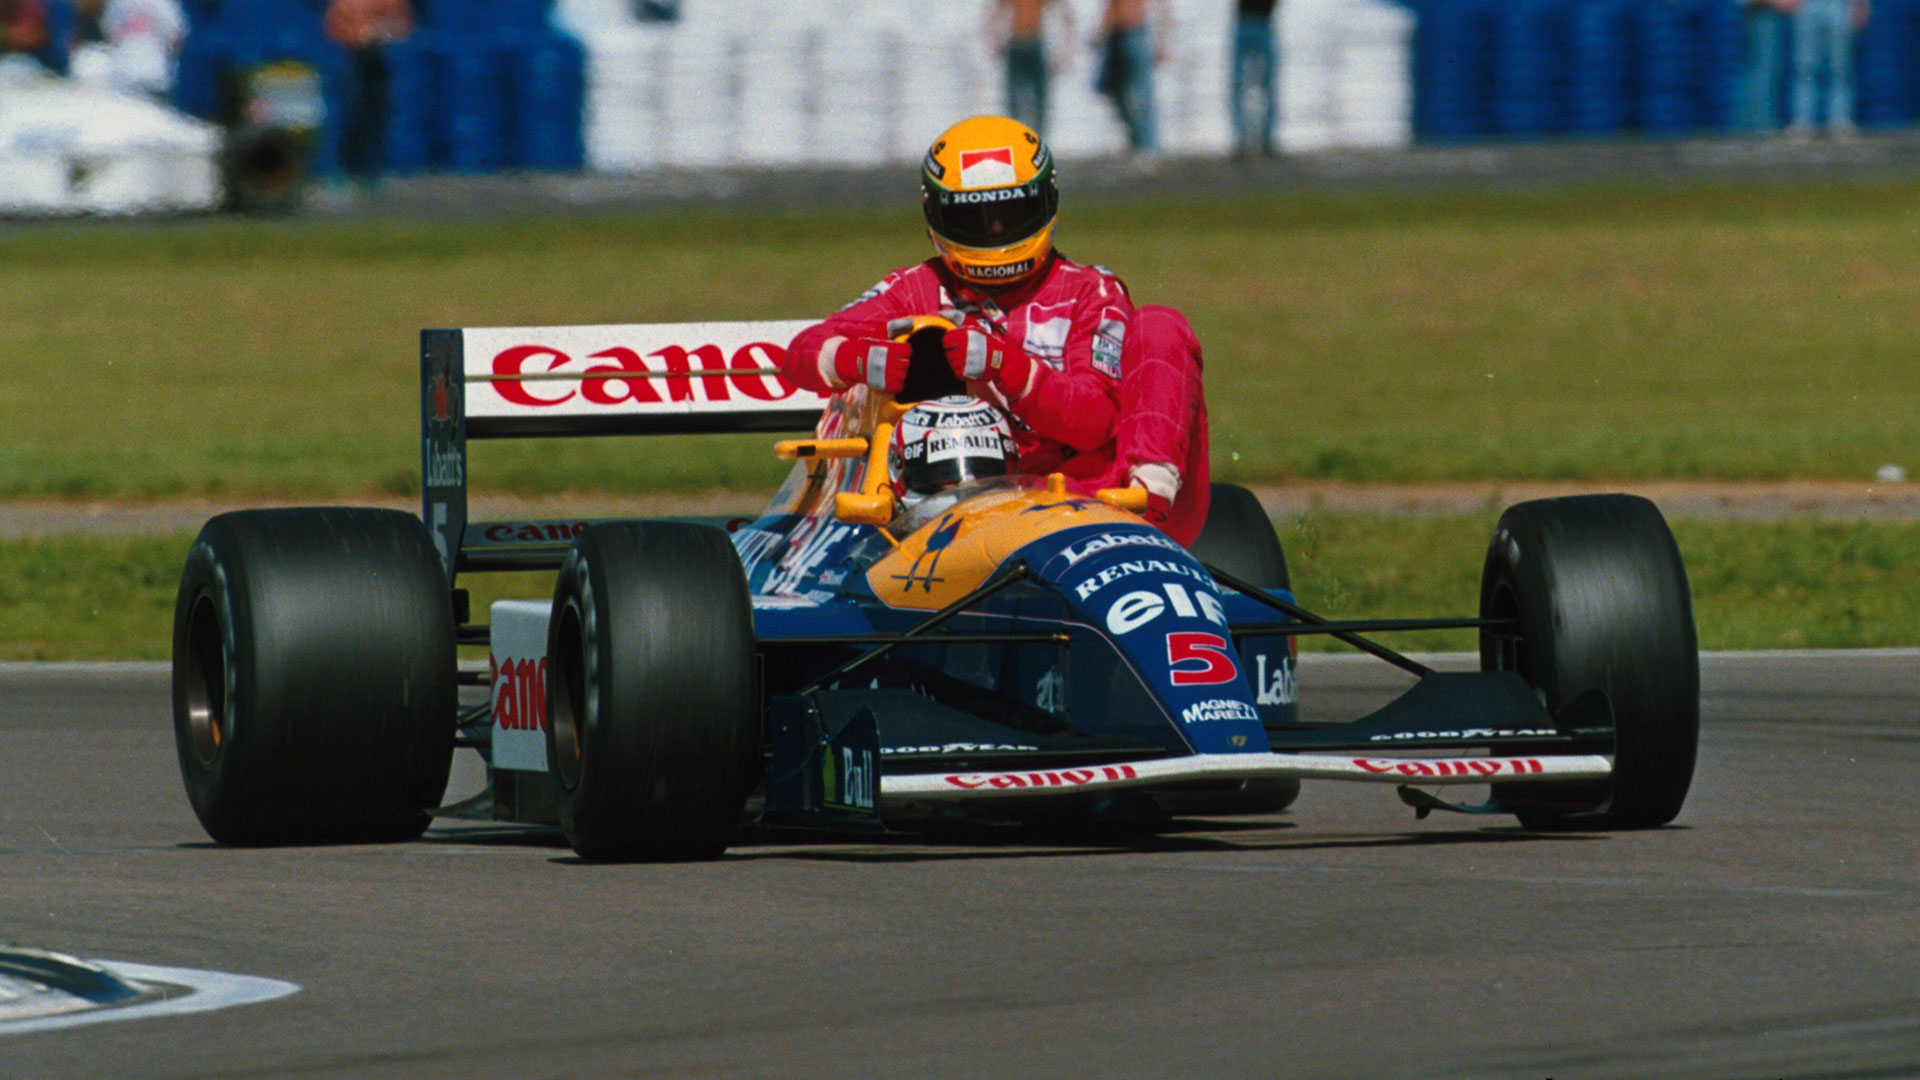 Ayrton Senna getting a lift of Nigel Mansell on his Williams FW14B Renault (1992)